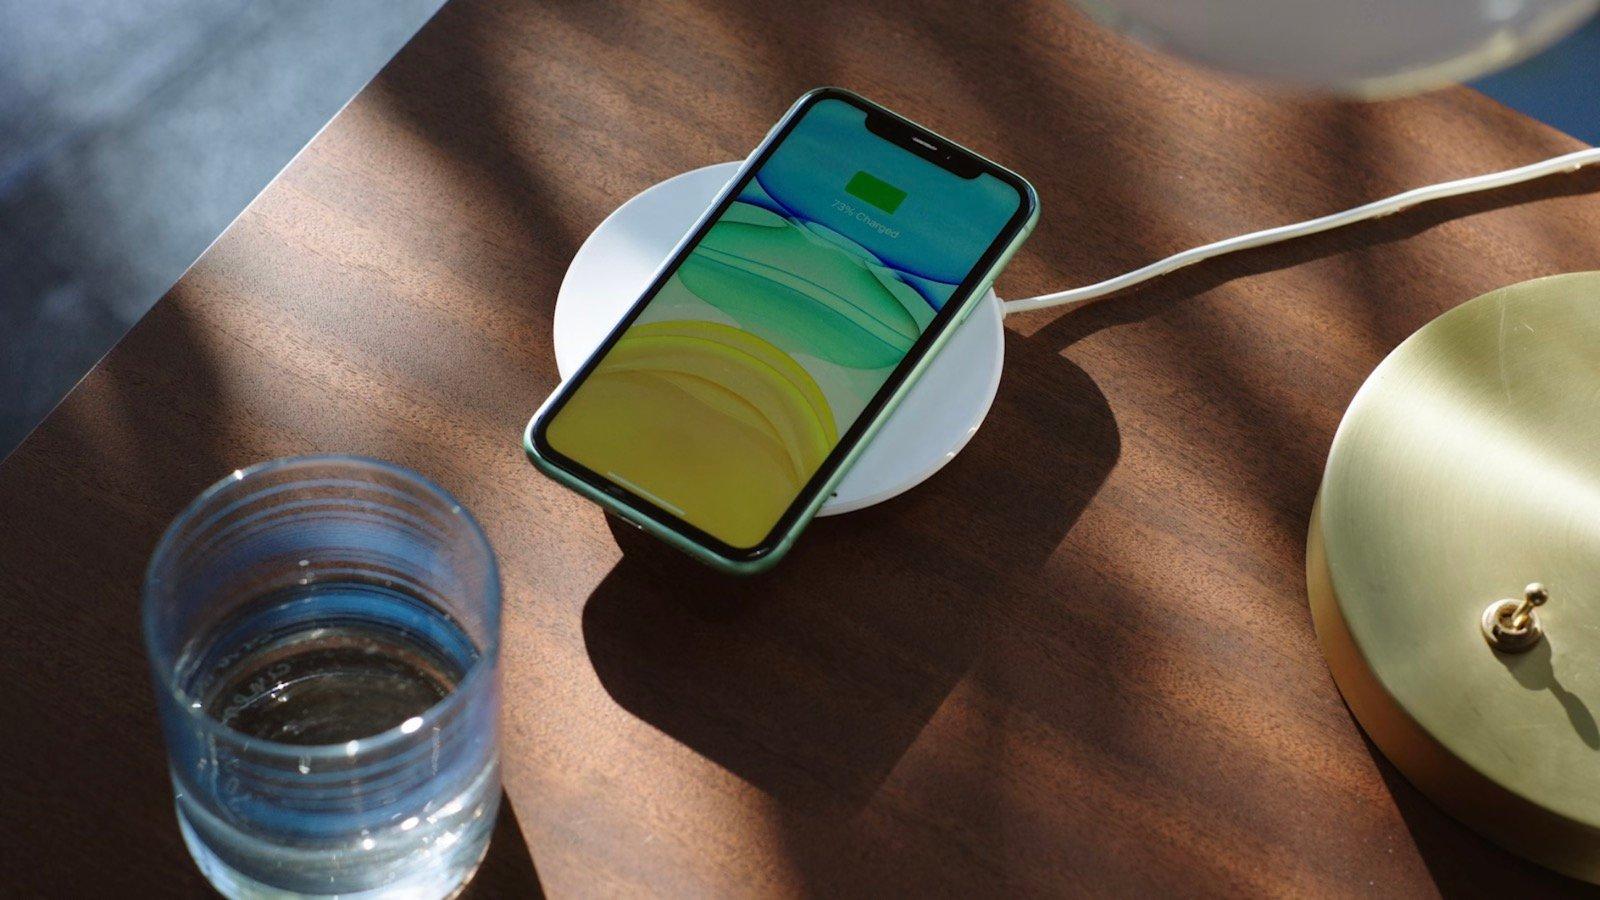 iPhone 12 Pro/Maxのバッテリー容量も判明